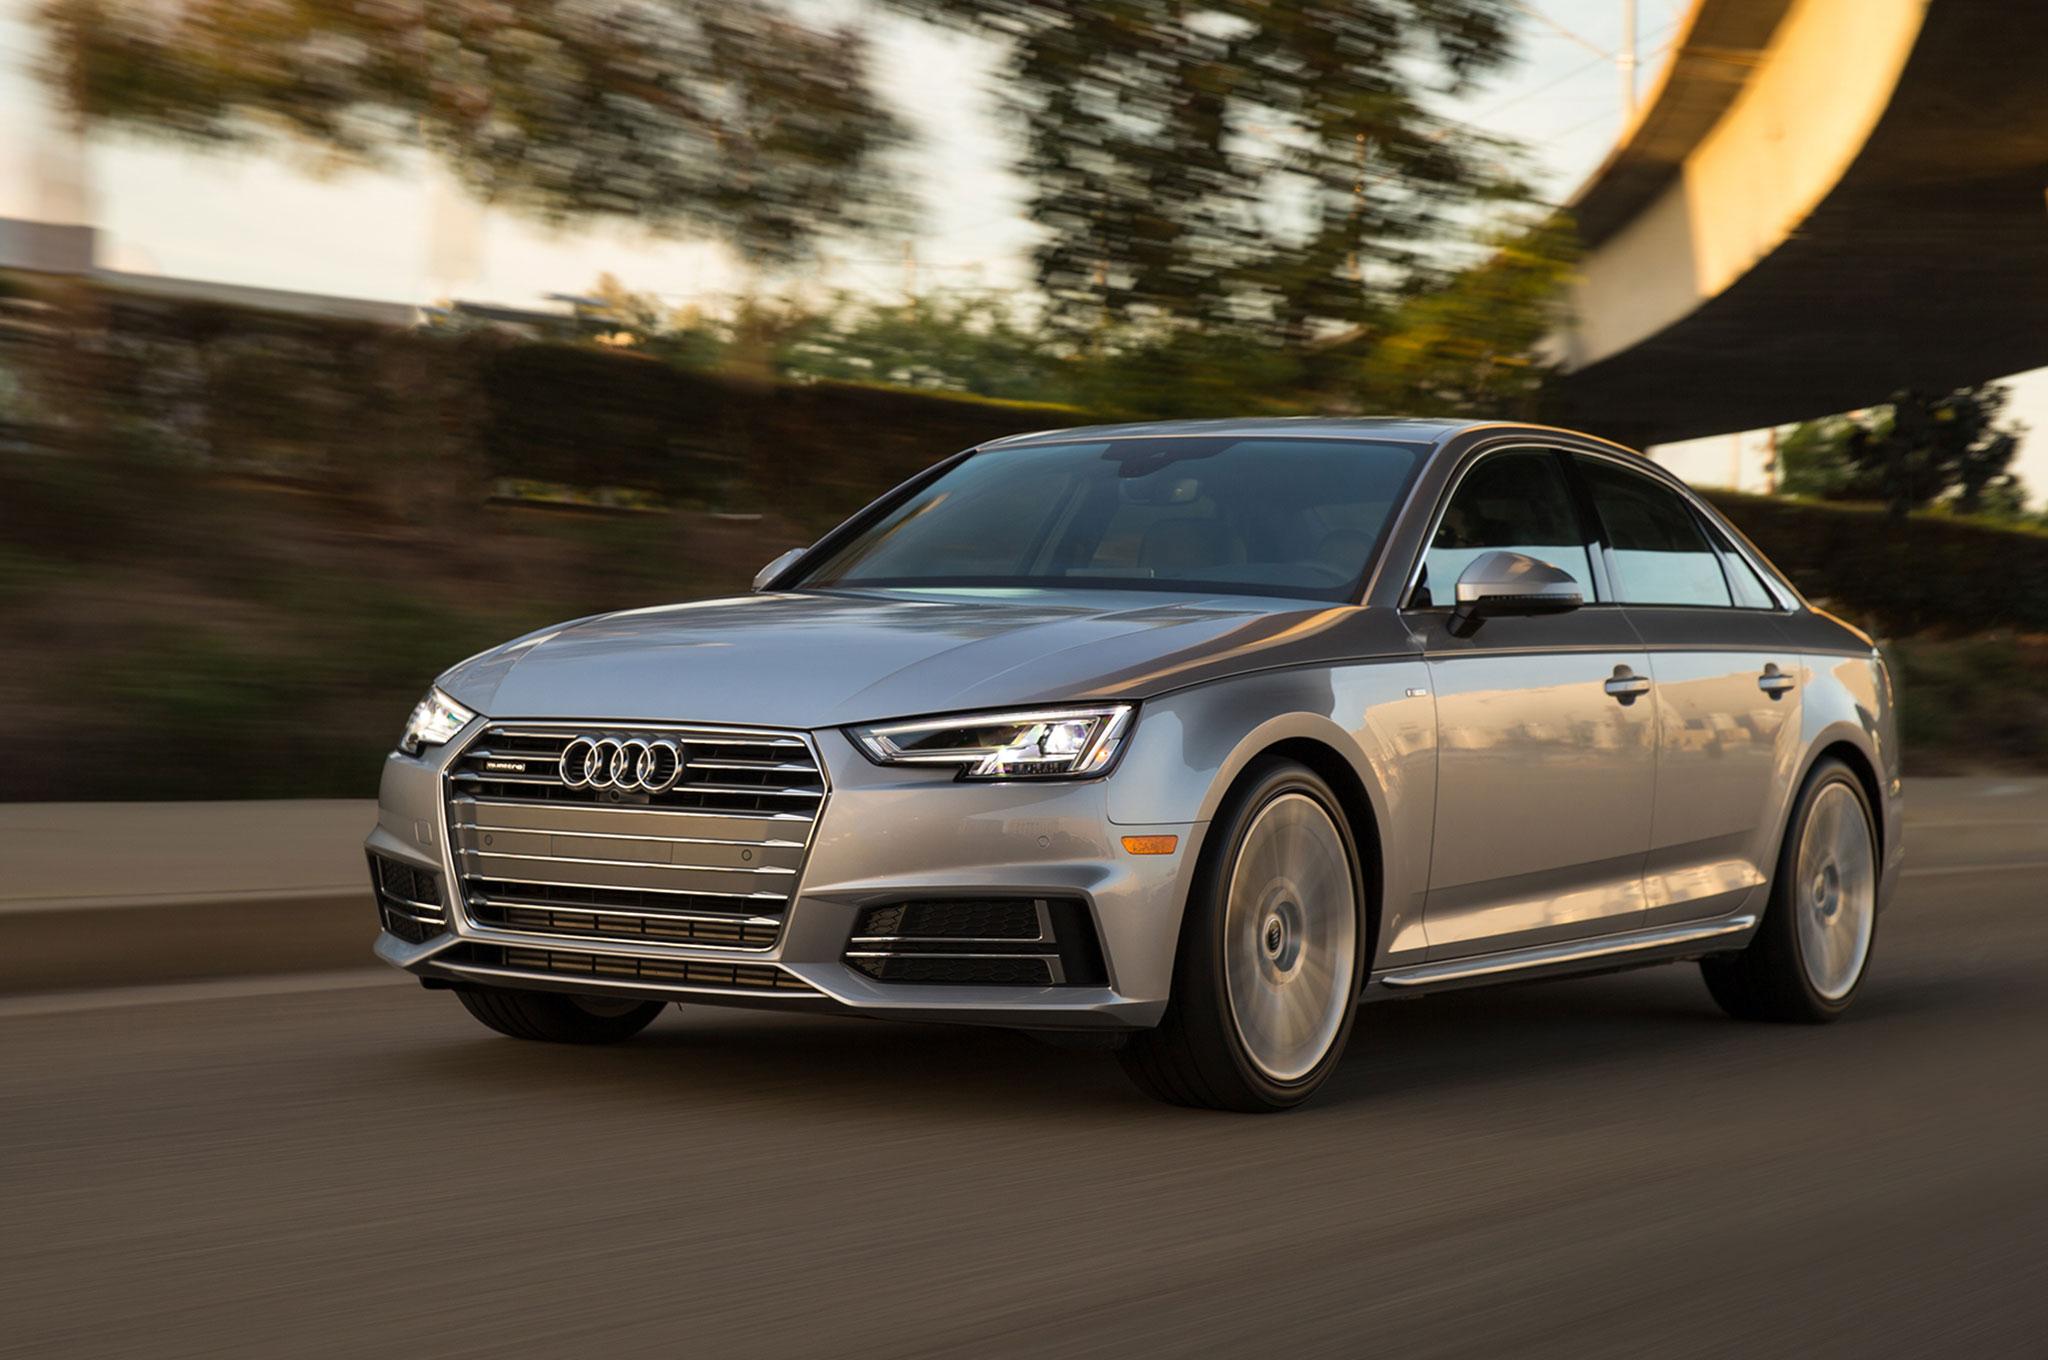 2018 Audi A4 Manual Quick Take Review   Automobile Magazine